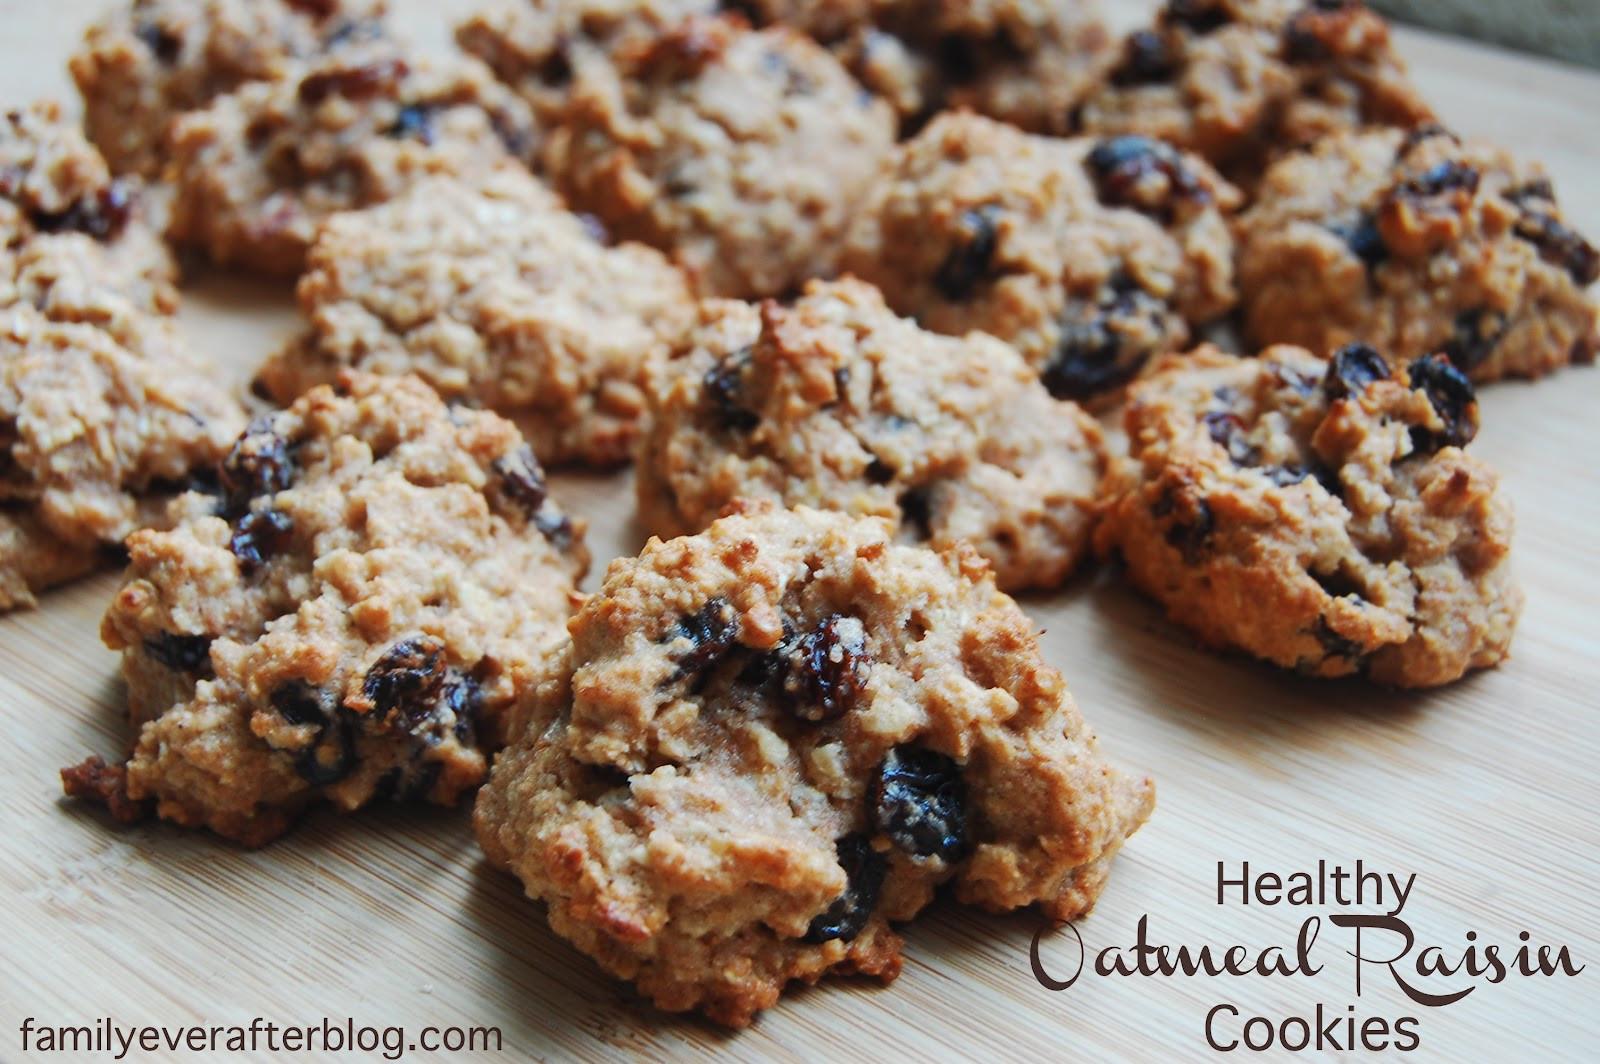 Are Oatmeal Raisin Cookies Healthy  Healthy Oatmeal Raisin Cookies